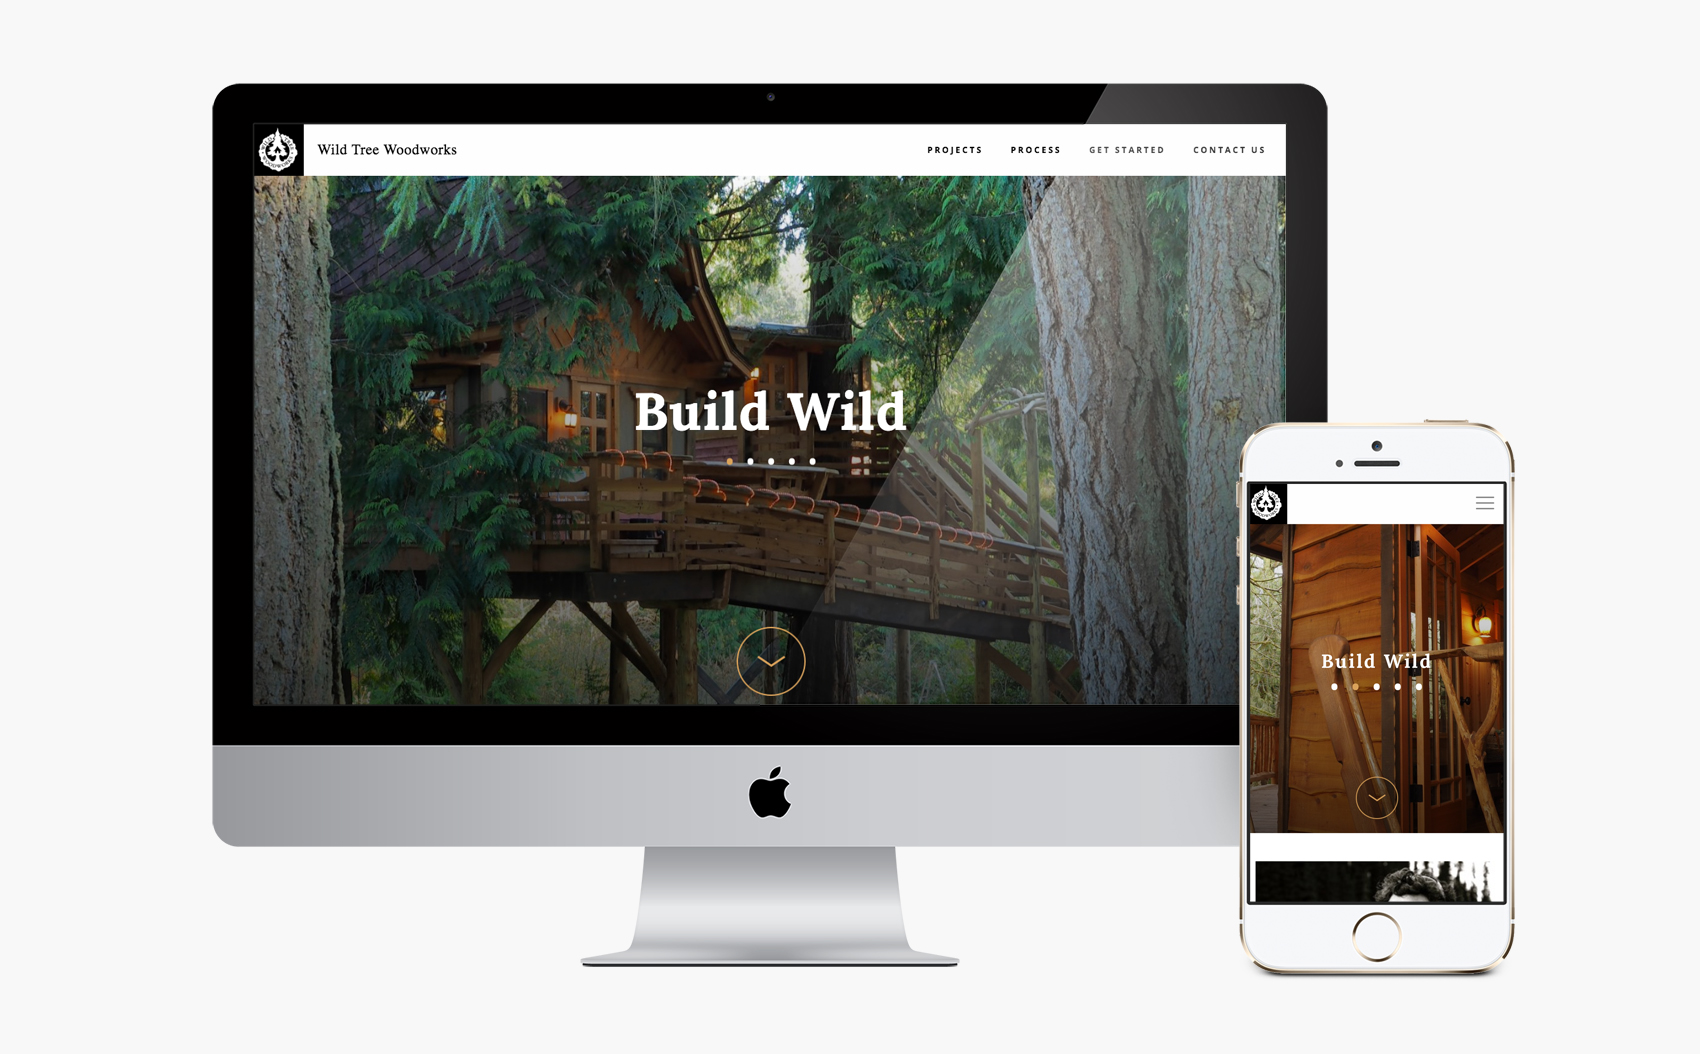 Build Wild - Wild Tree Woodworks